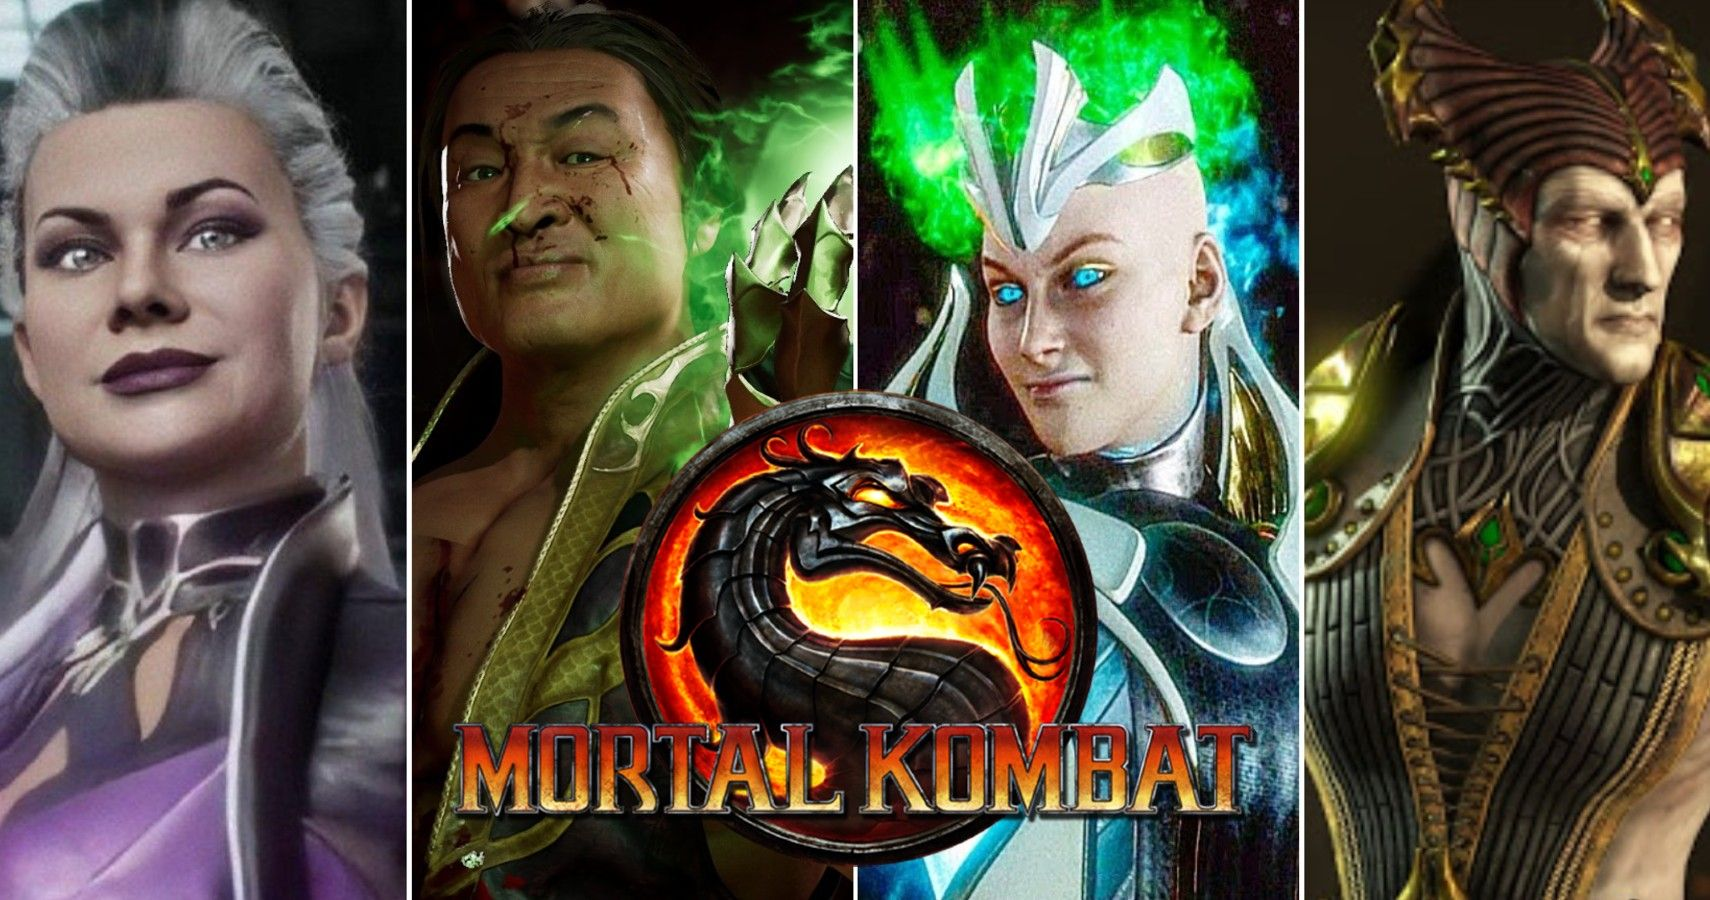 Mortal Kombat 5 Most Sympathetic 5 Most Evil Villains Cbr